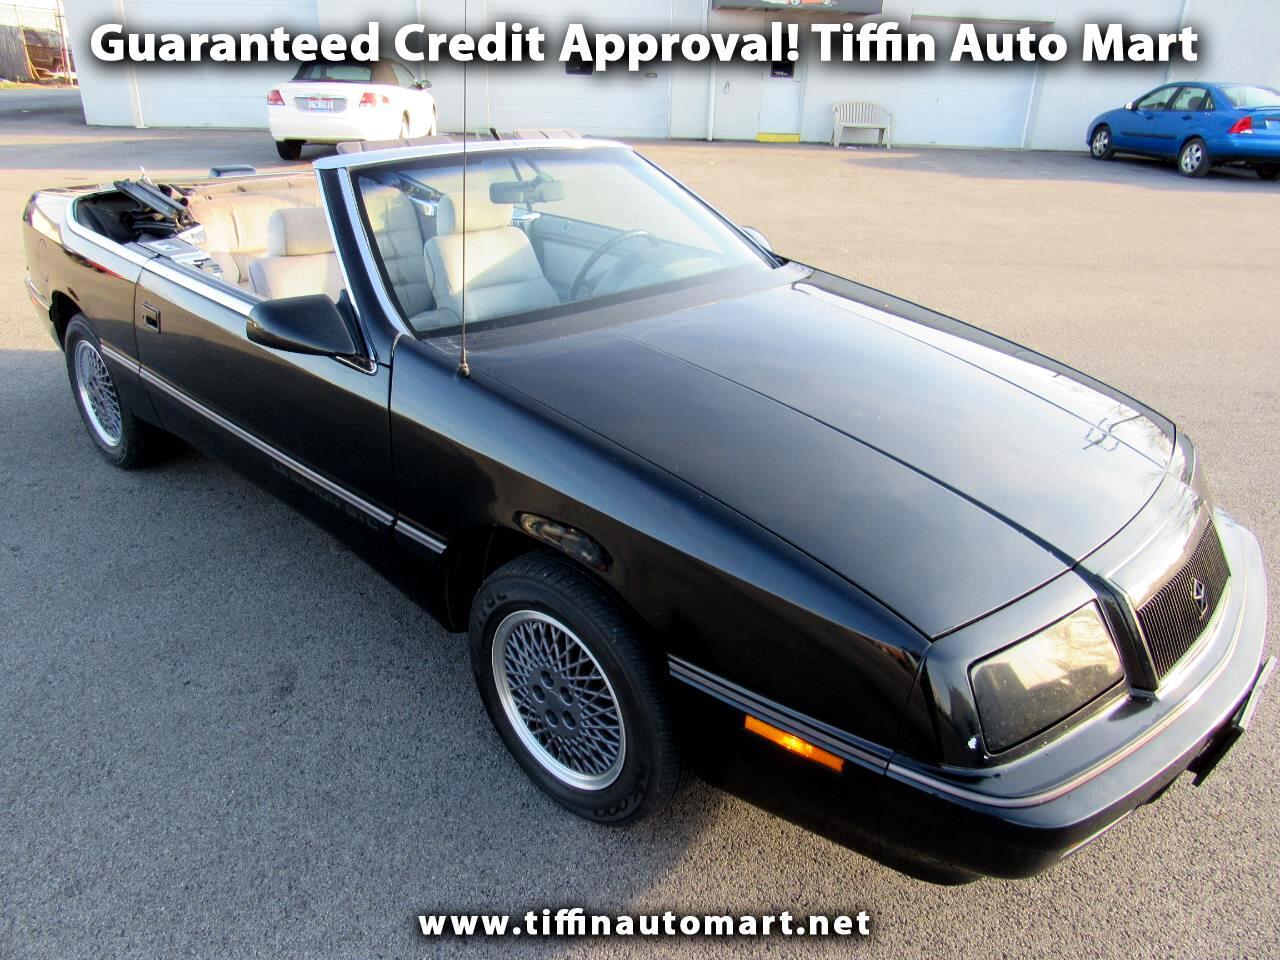 1991 Chrysler LeBaron Highline convertible